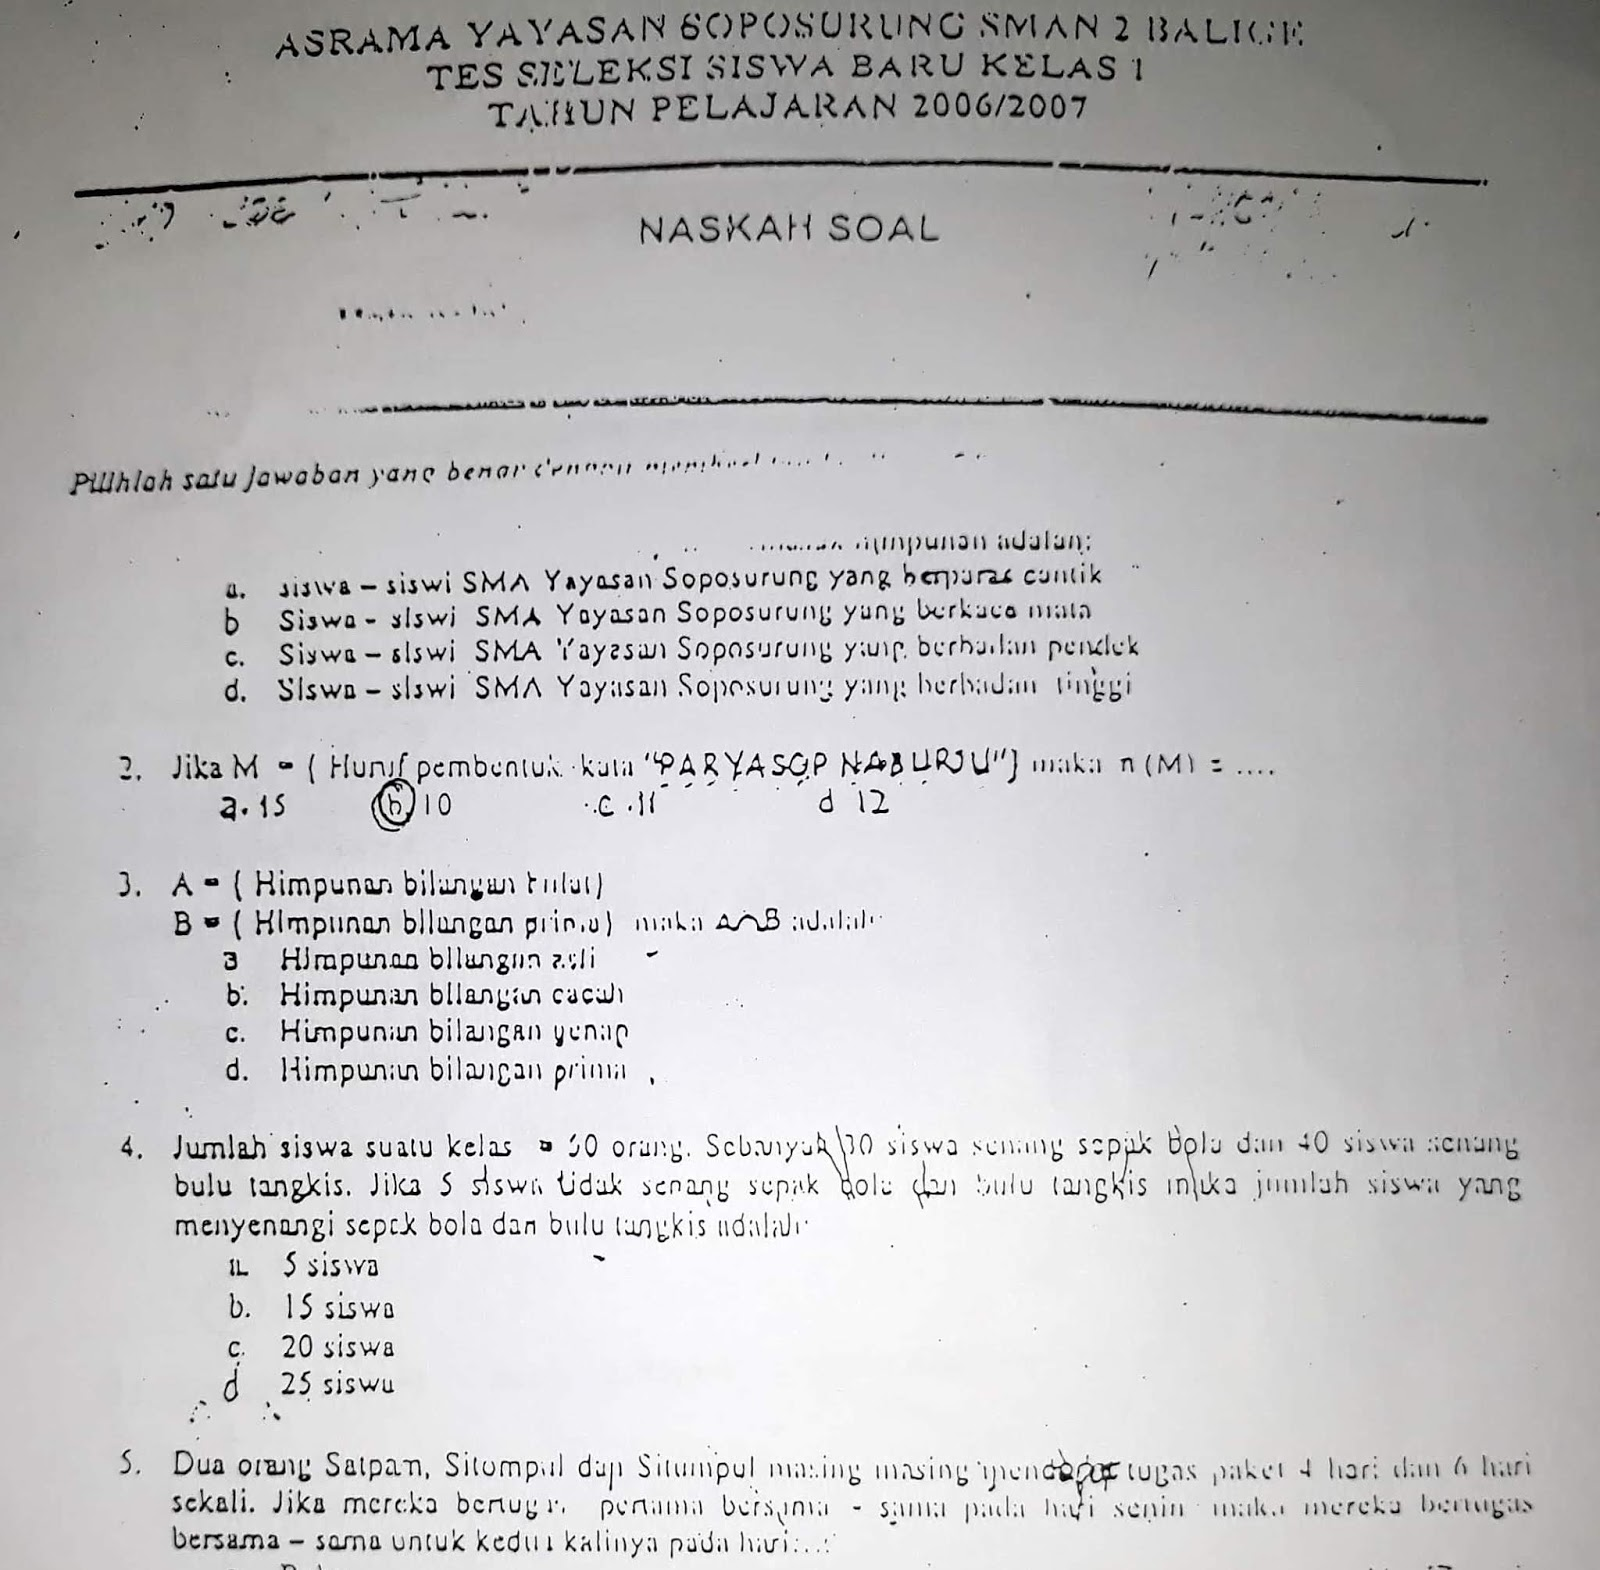 40 Soal Dan Pembahasan Seleksi Akademik Masuk Asrama Yayasan Tb Soposurung Asrama Yasop Sman 2 Balige 2006 Defantri Com